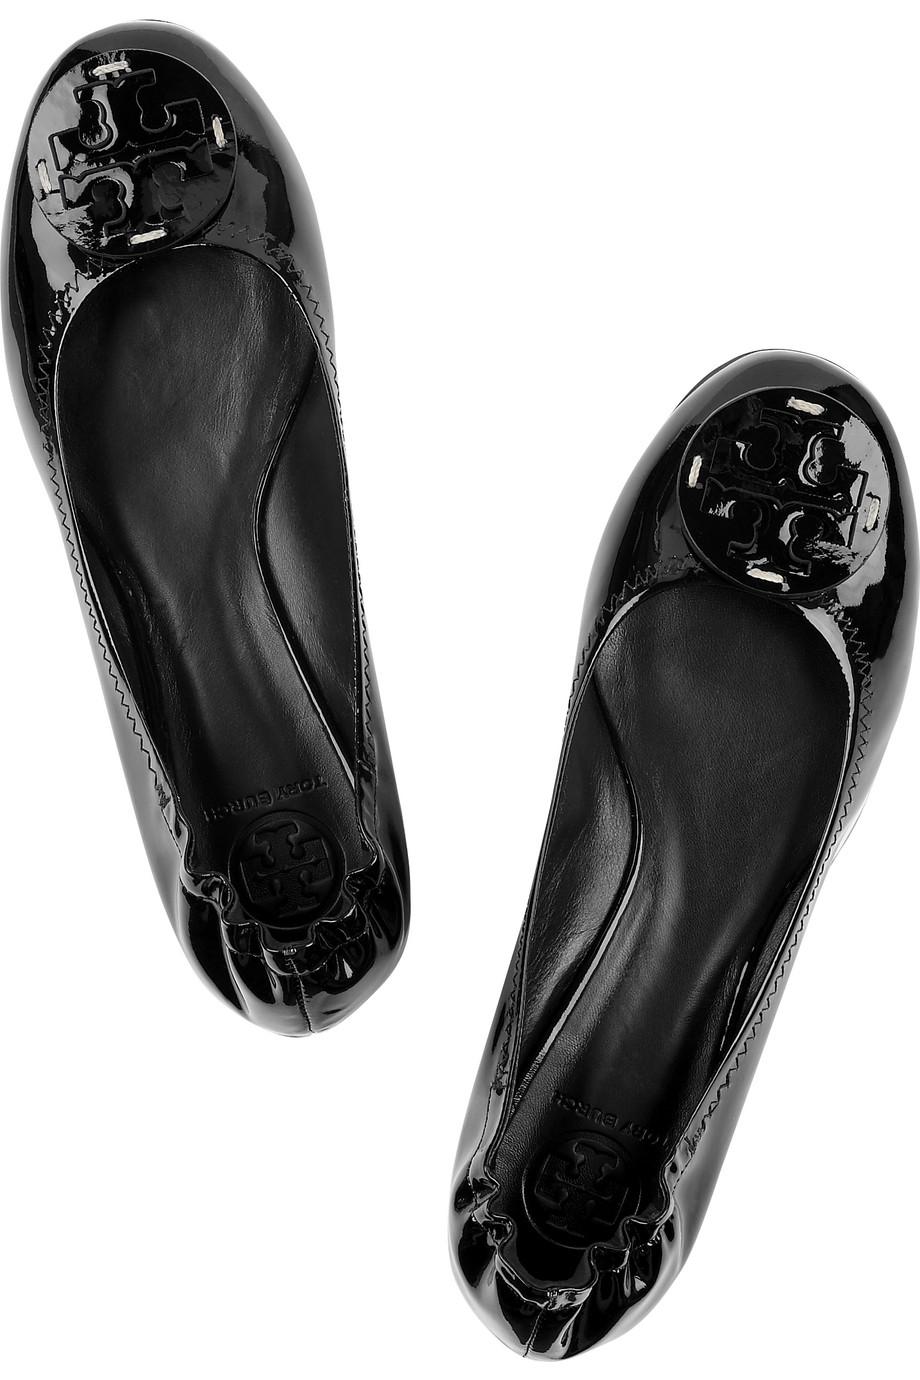 tory burch reva patent leather ballerina flats in black lyst. Black Bedroom Furniture Sets. Home Design Ideas